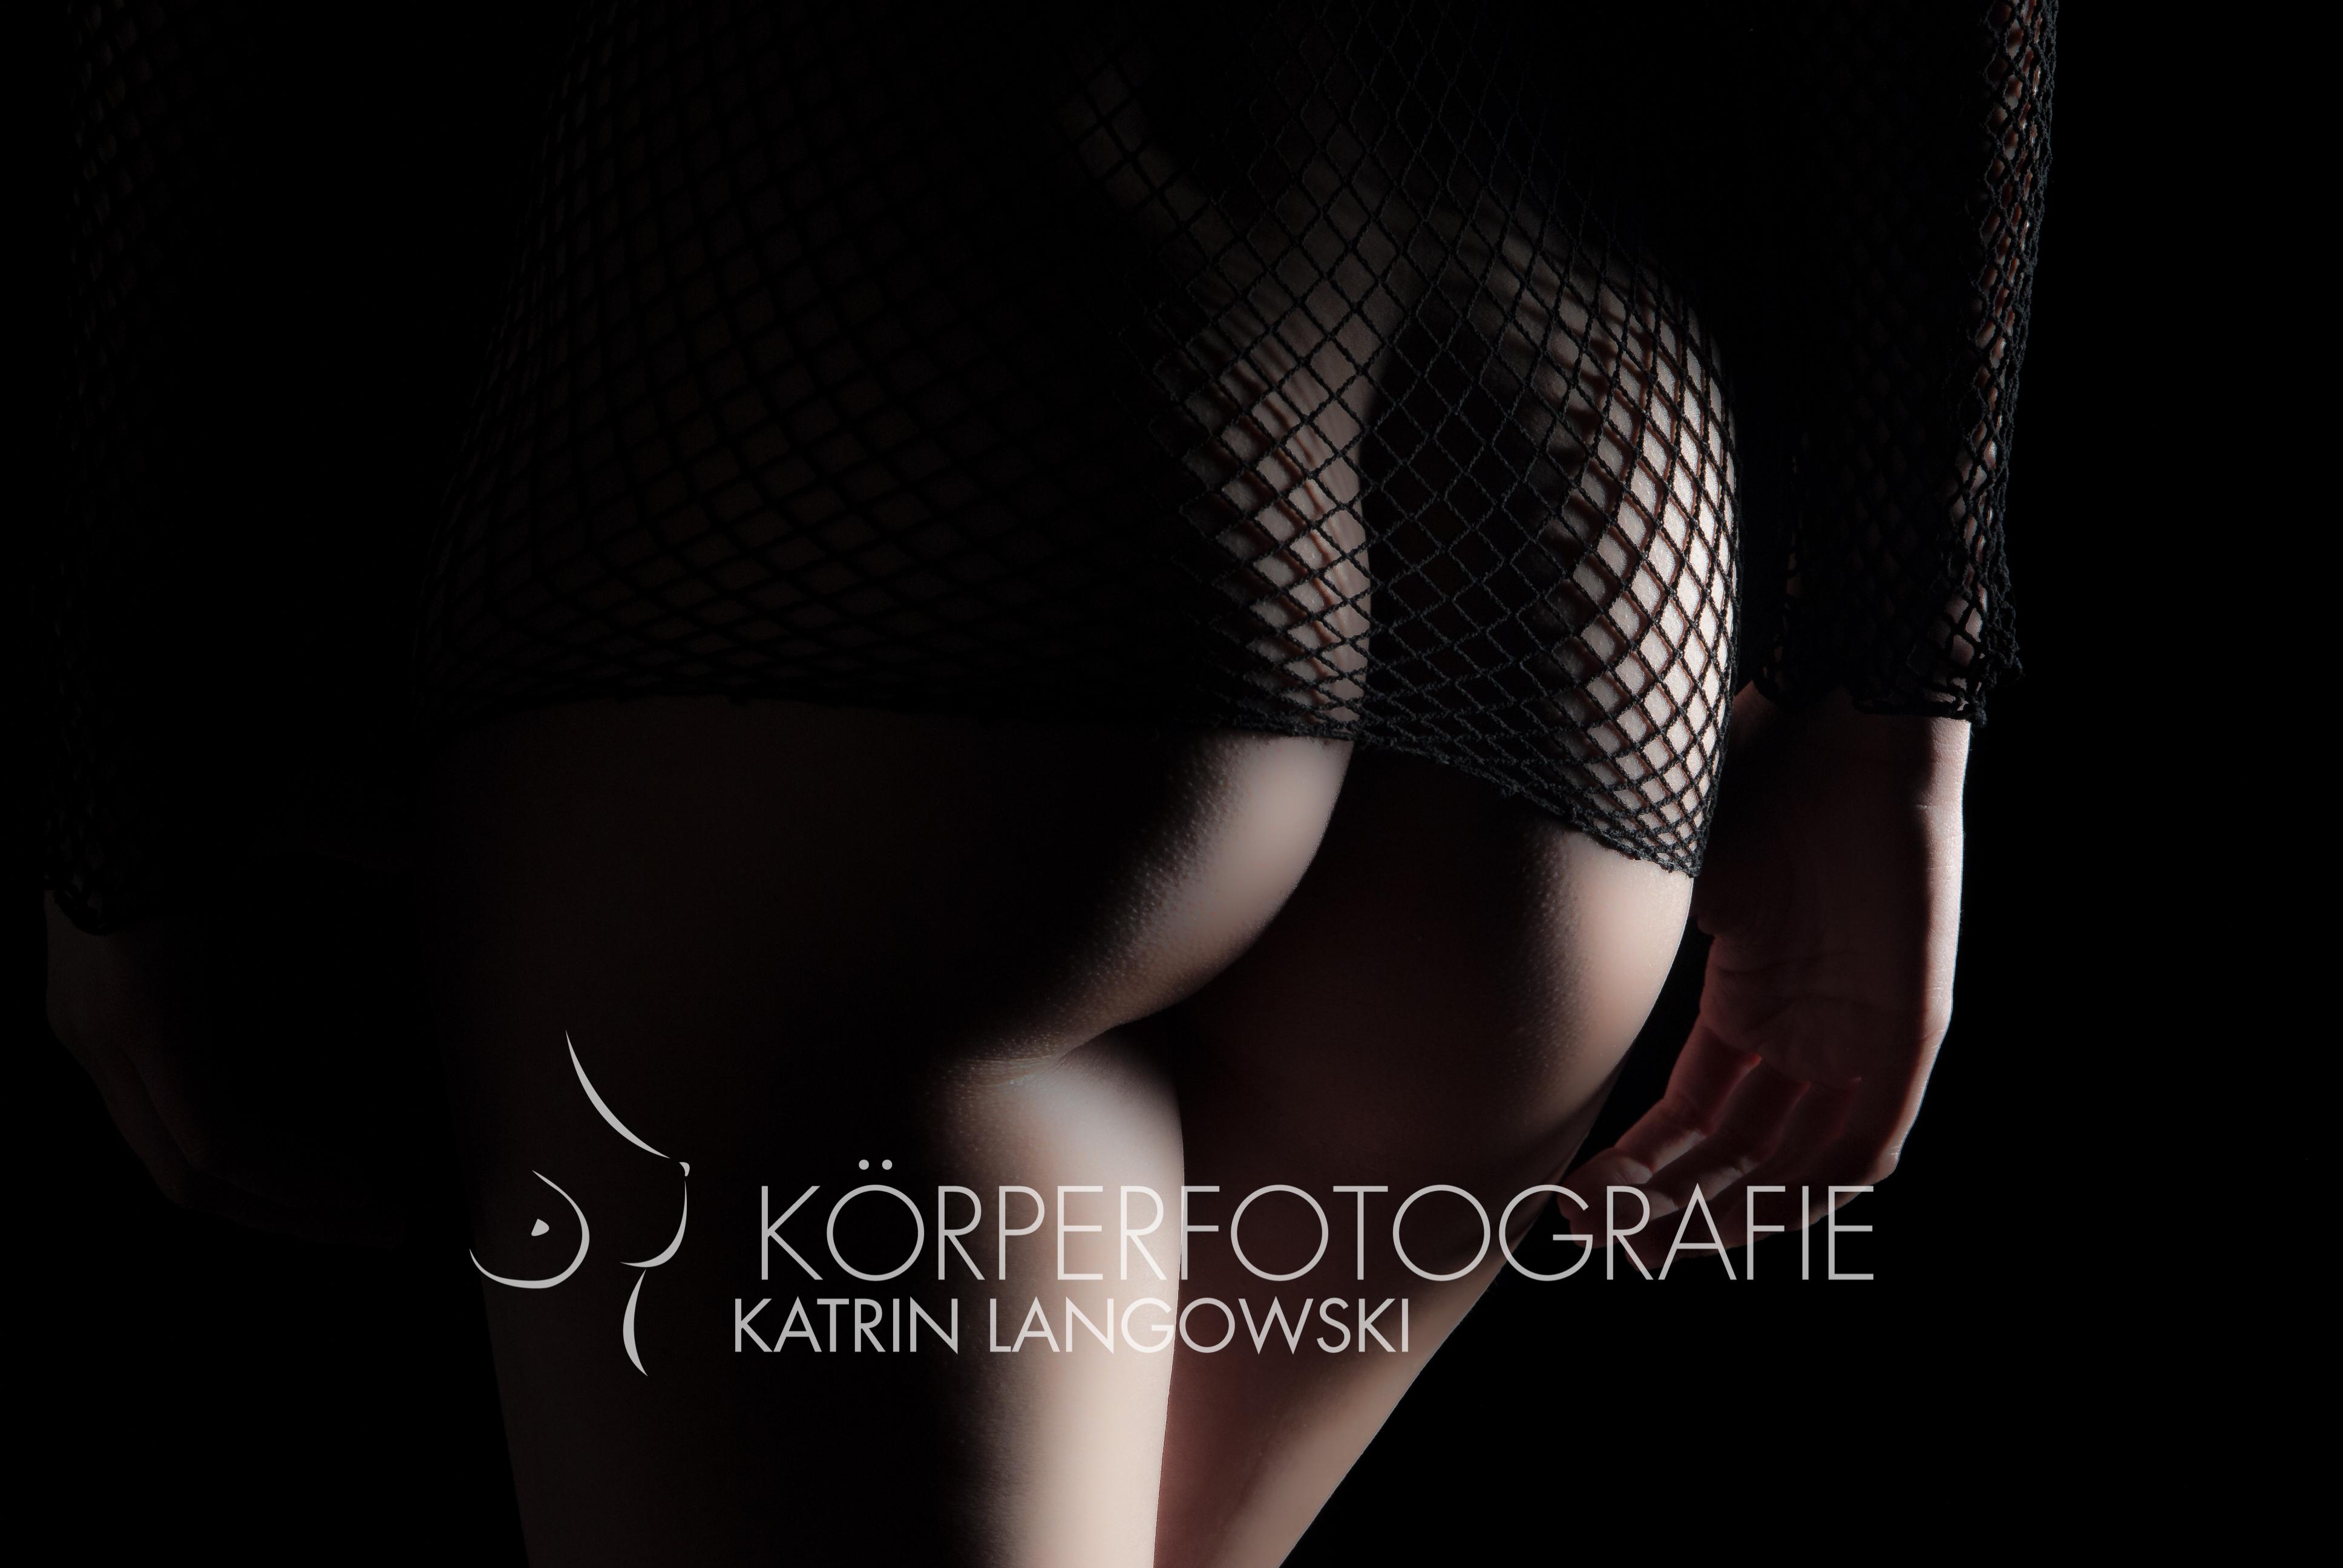 koerperfotografie_fuer_frauen_katrin_langowski_interview_auf_soulsistermeetsfriends